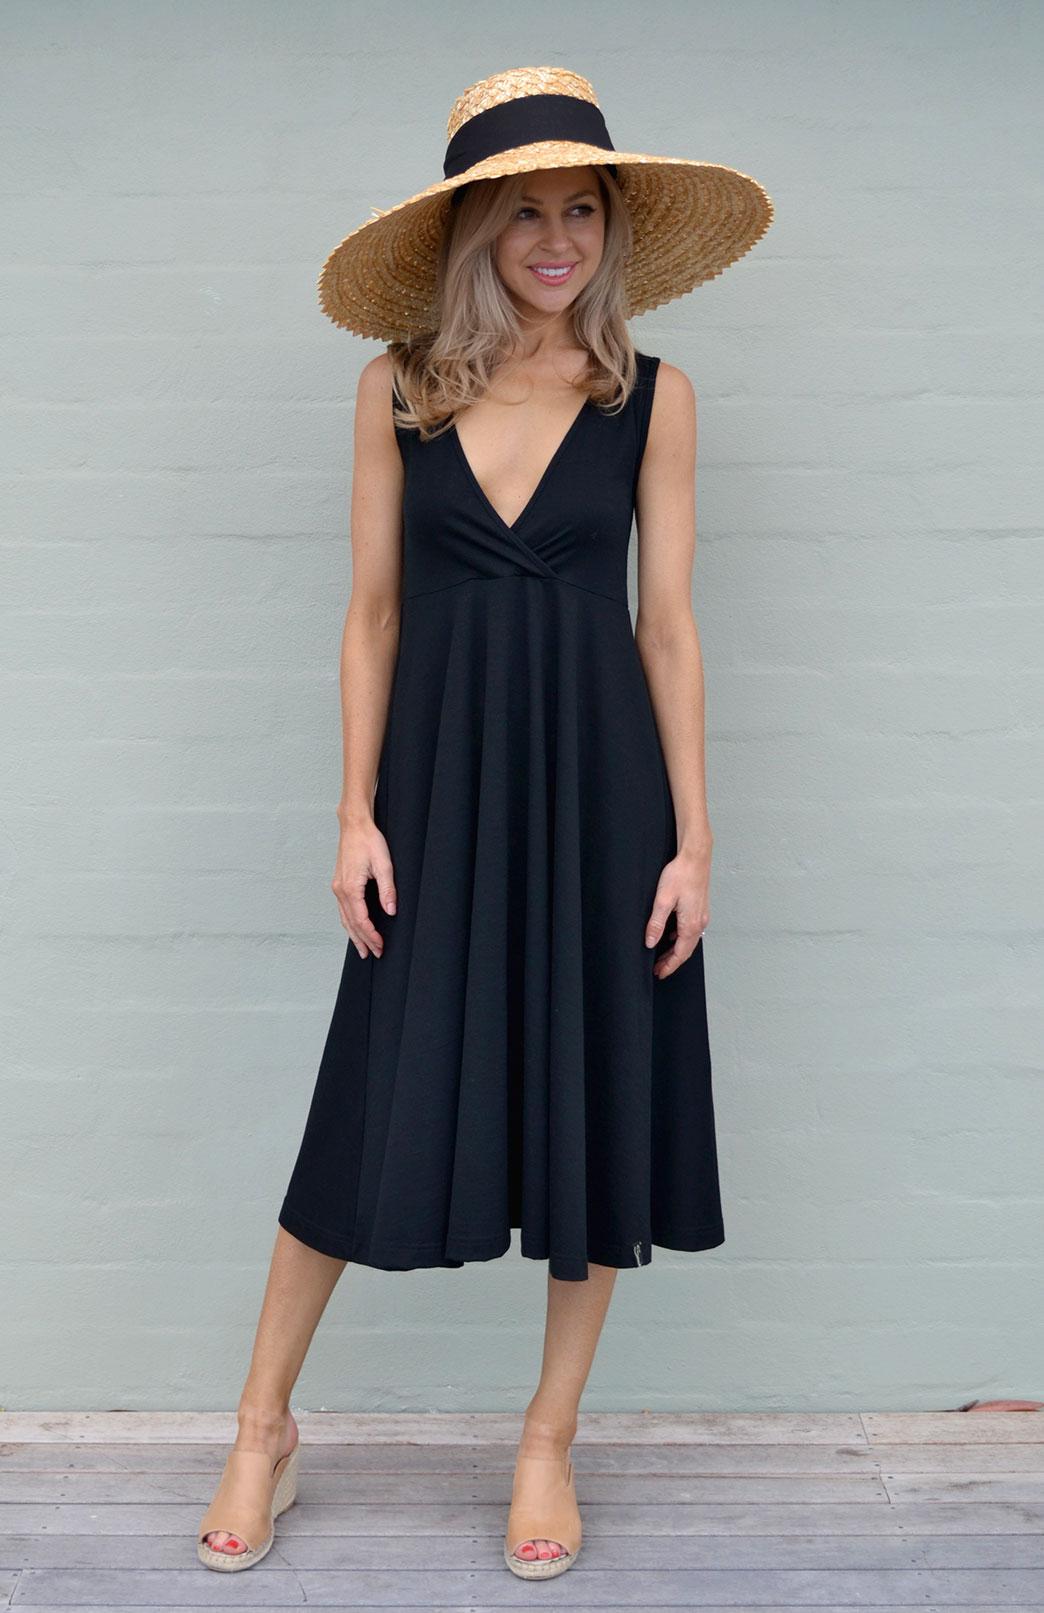 Caitlin Dress - Women's Black Sleeveless Woollen Maternity Style Dress with Full A-Line Skirt. - Smitten Merino Tasmania Australia